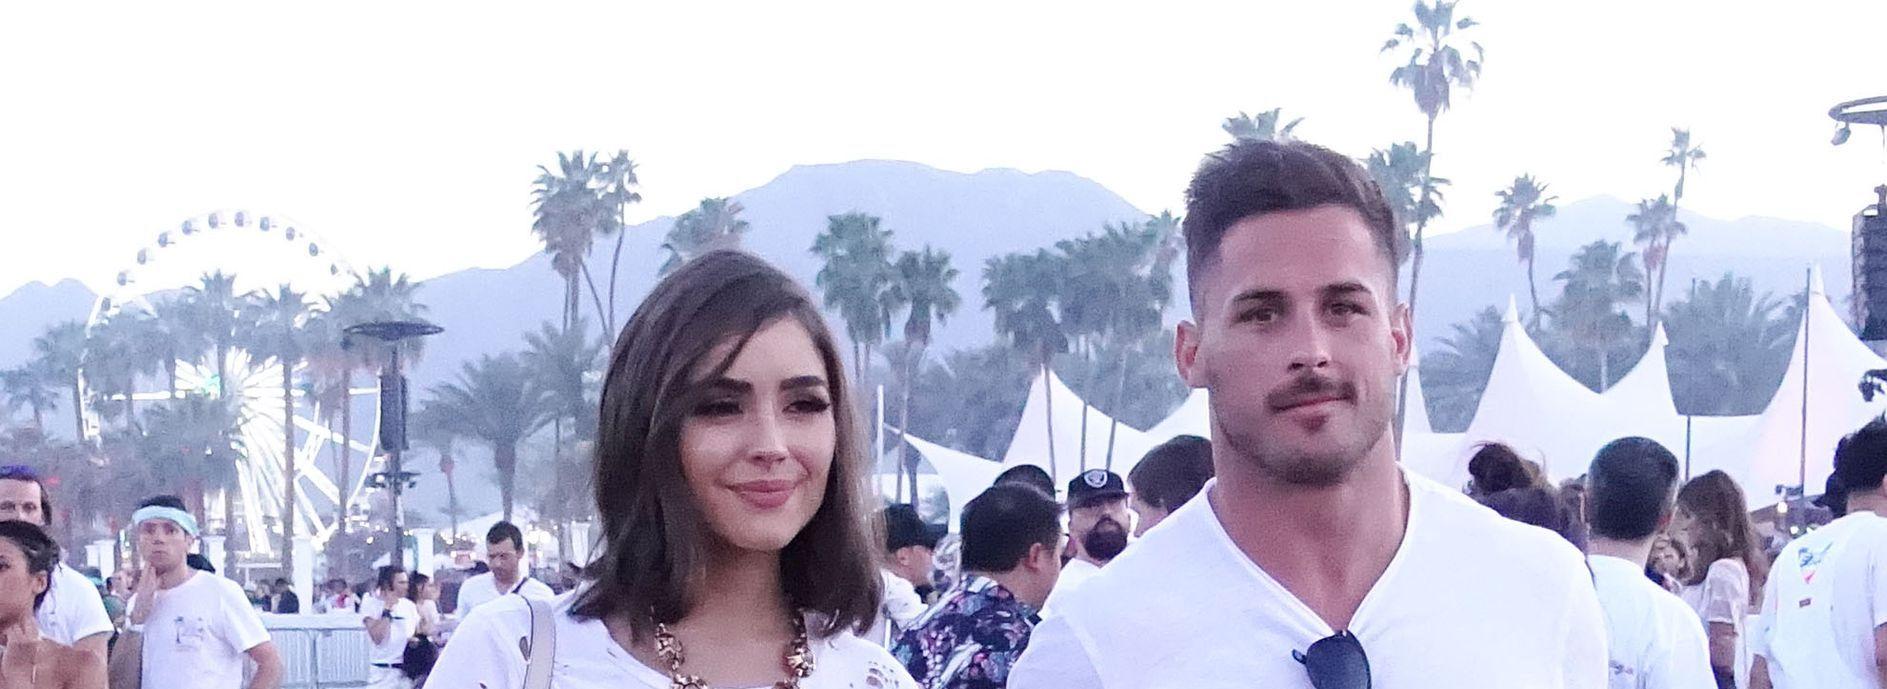 Olivia Culpo's Ex Danny Amendola Just Exposed Her in an Explosive Instagram Rant